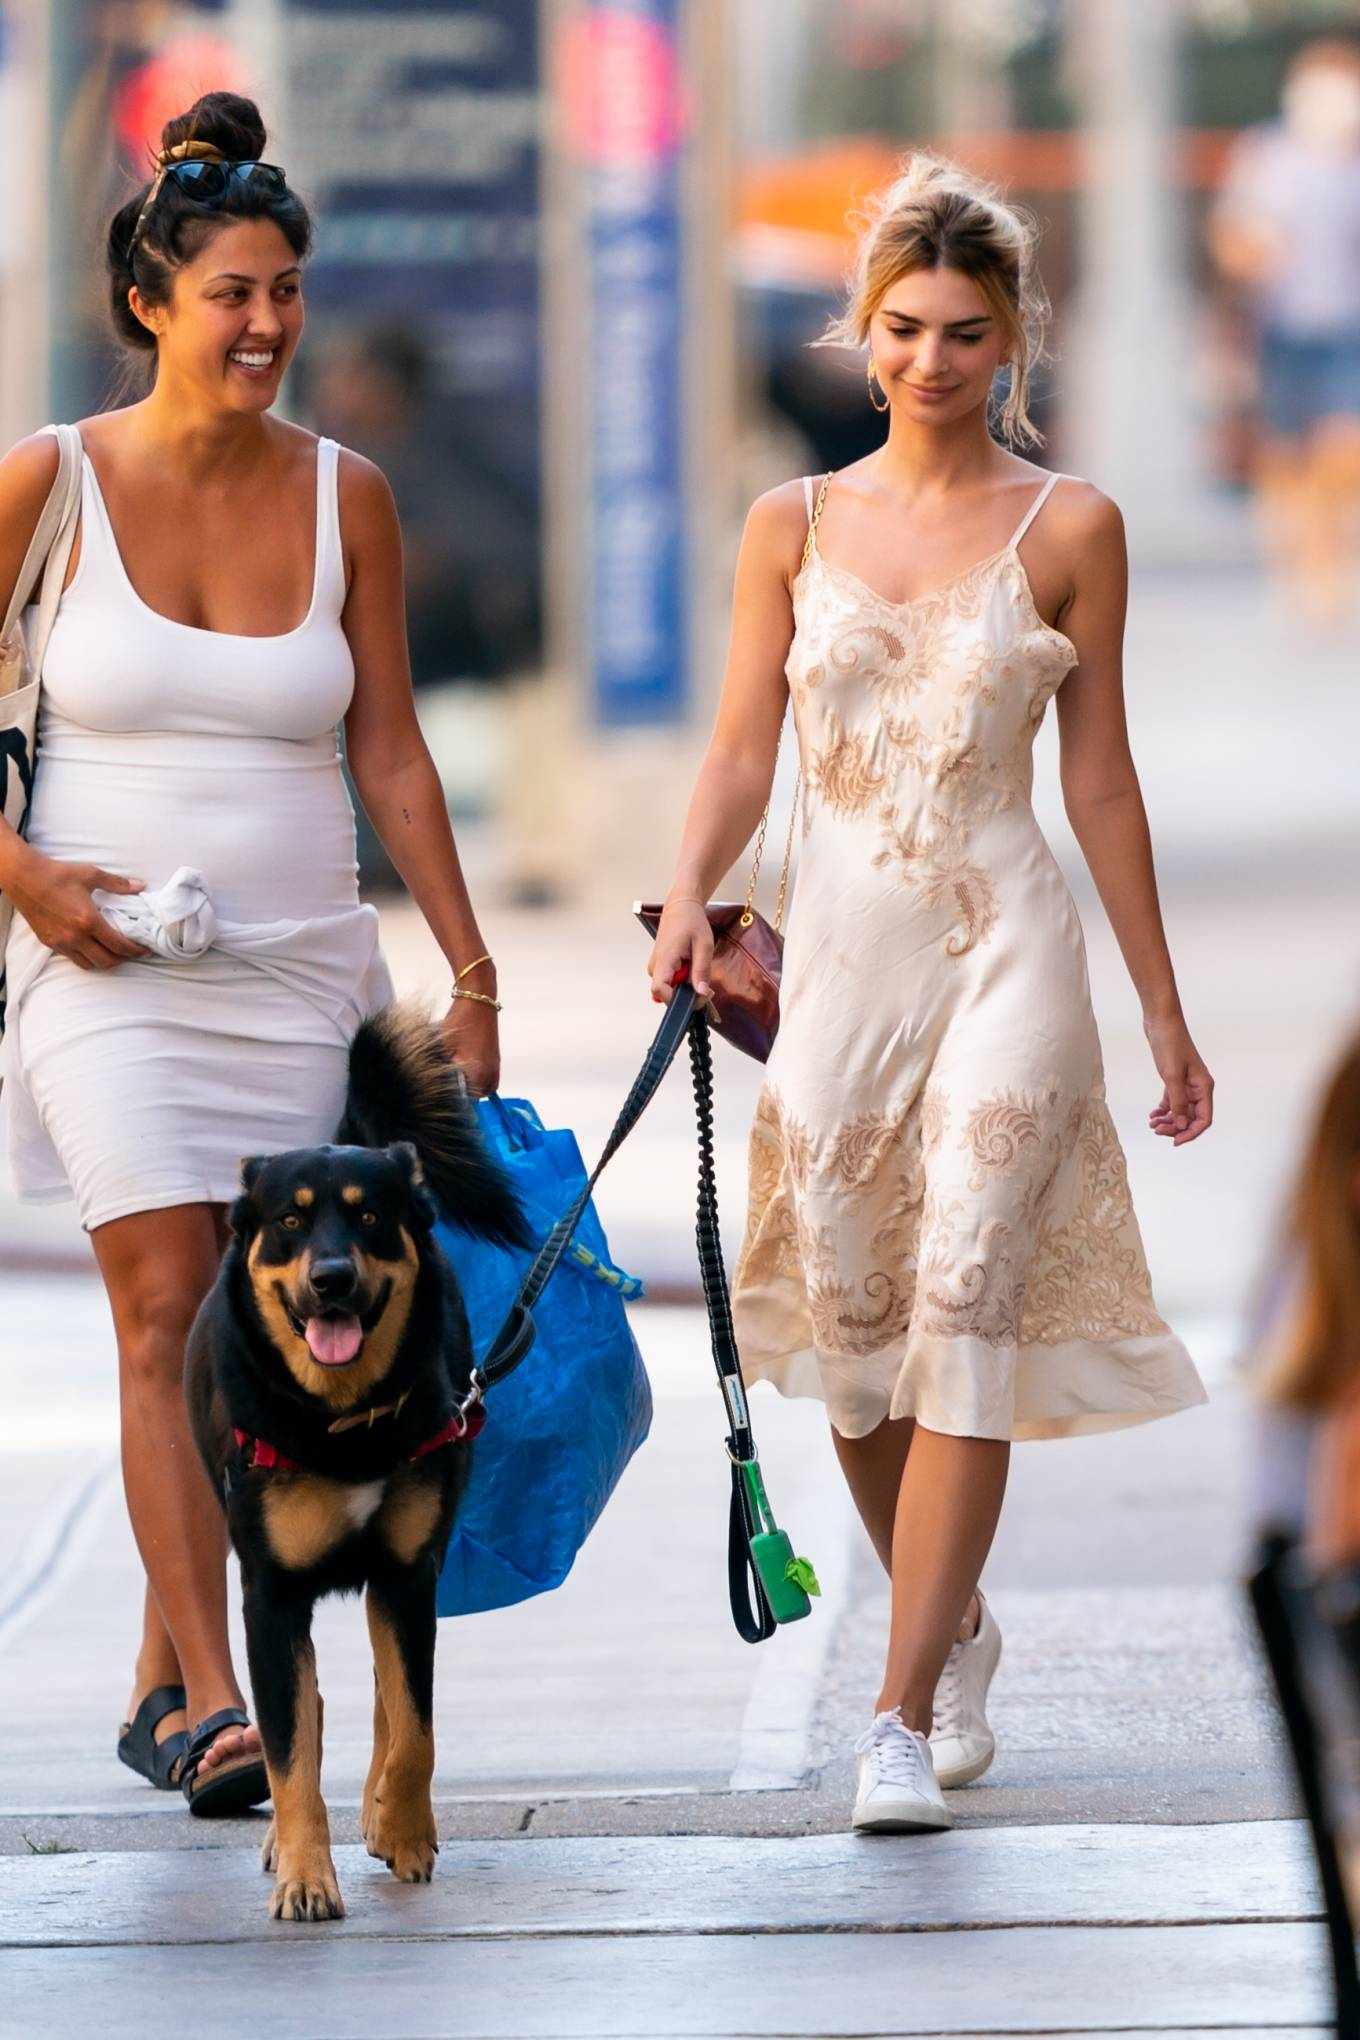 Emily Ratajkowski - Walking her dog Colombo in New York City